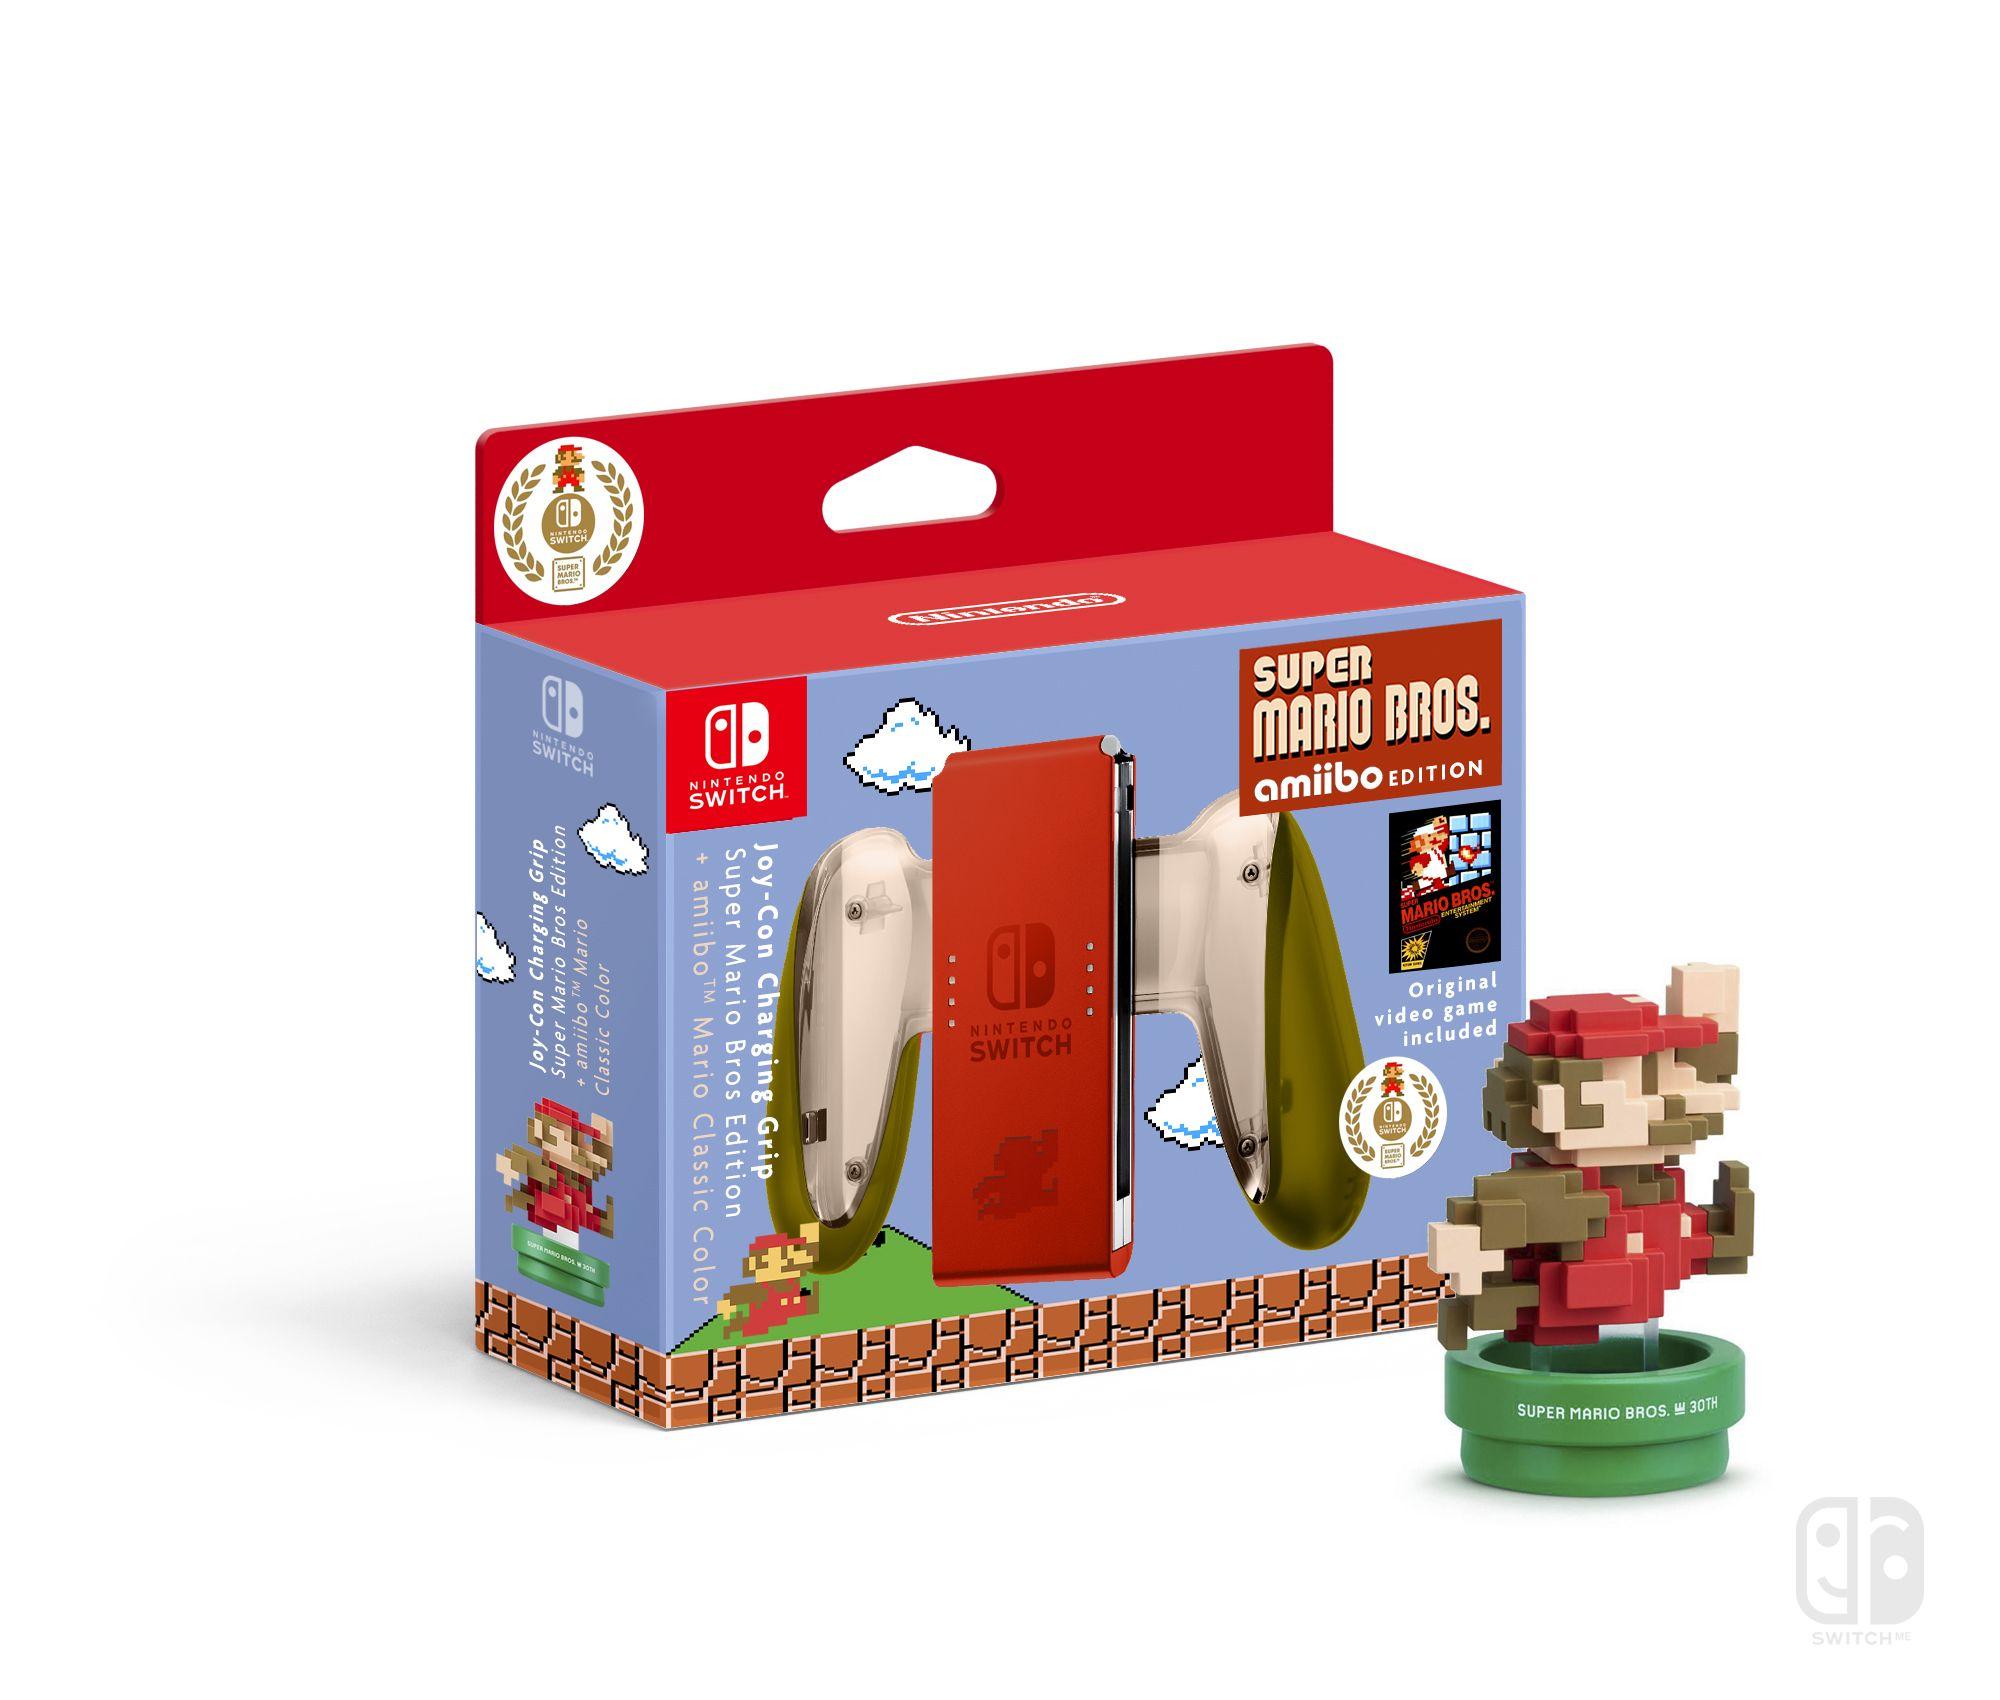 Joy Con Charging Grip Mario Classic Edition Nintendo Joy Con Collector Nintendo Switch A S Nintendo Switch Accessories Nintendo Switch Nintendo Switch Games